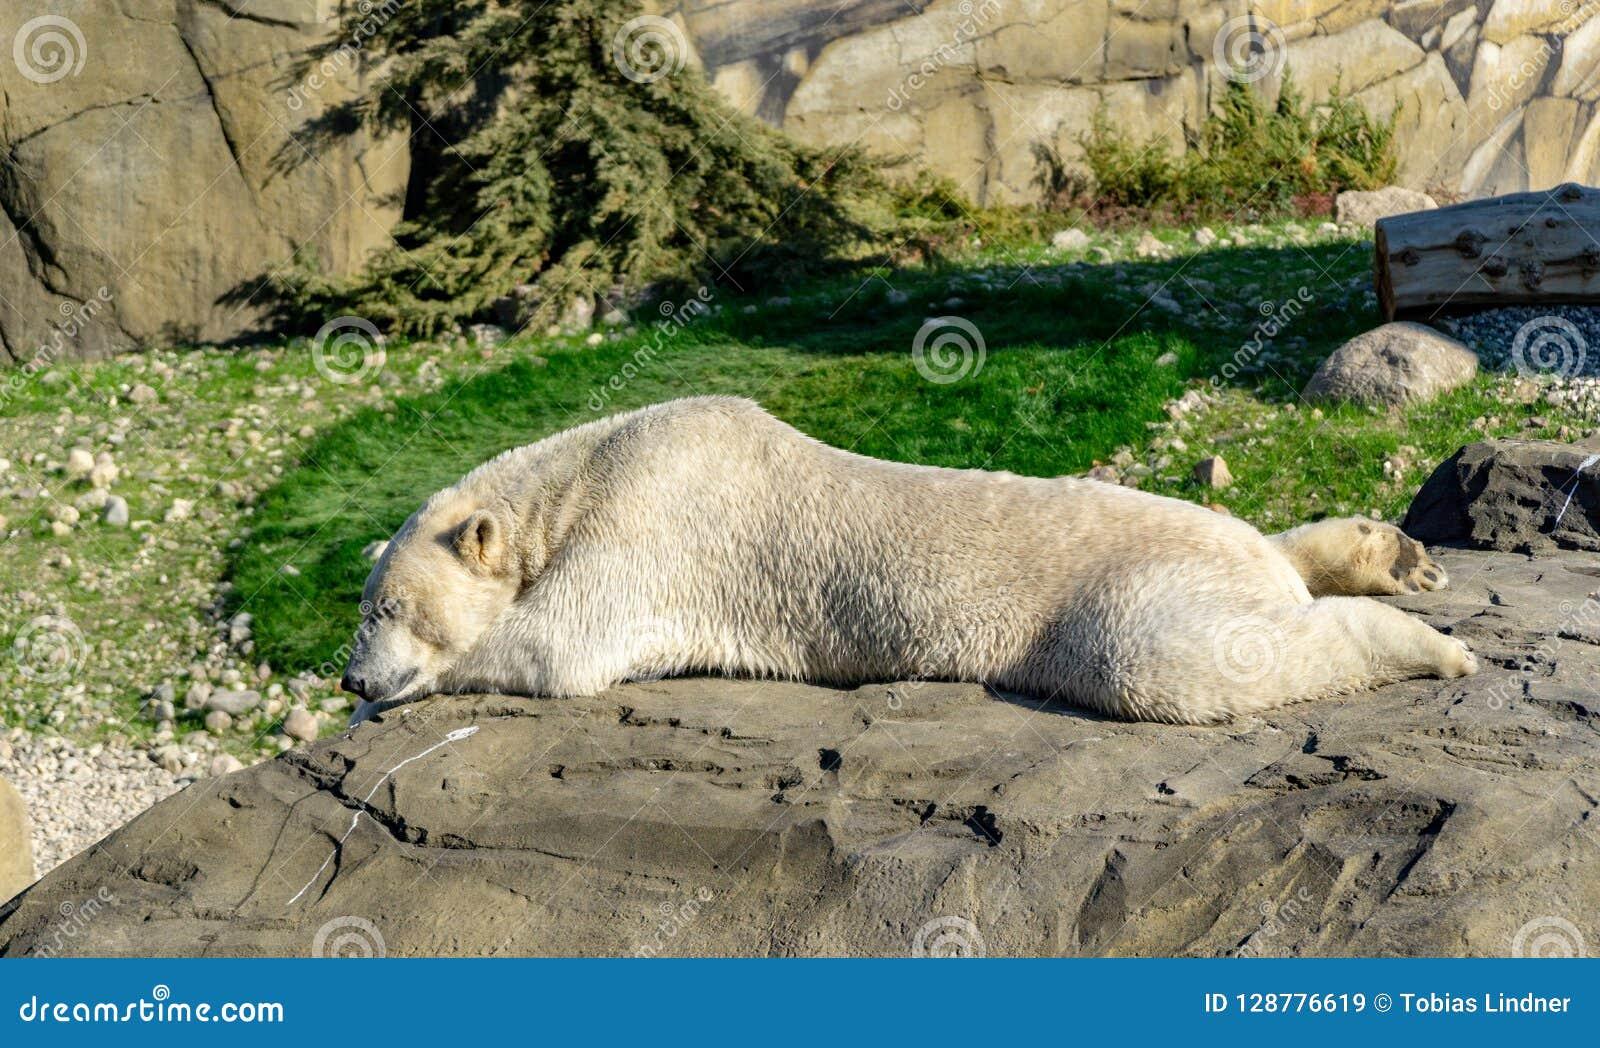 Polar bear or ice bear in an autumn landscape